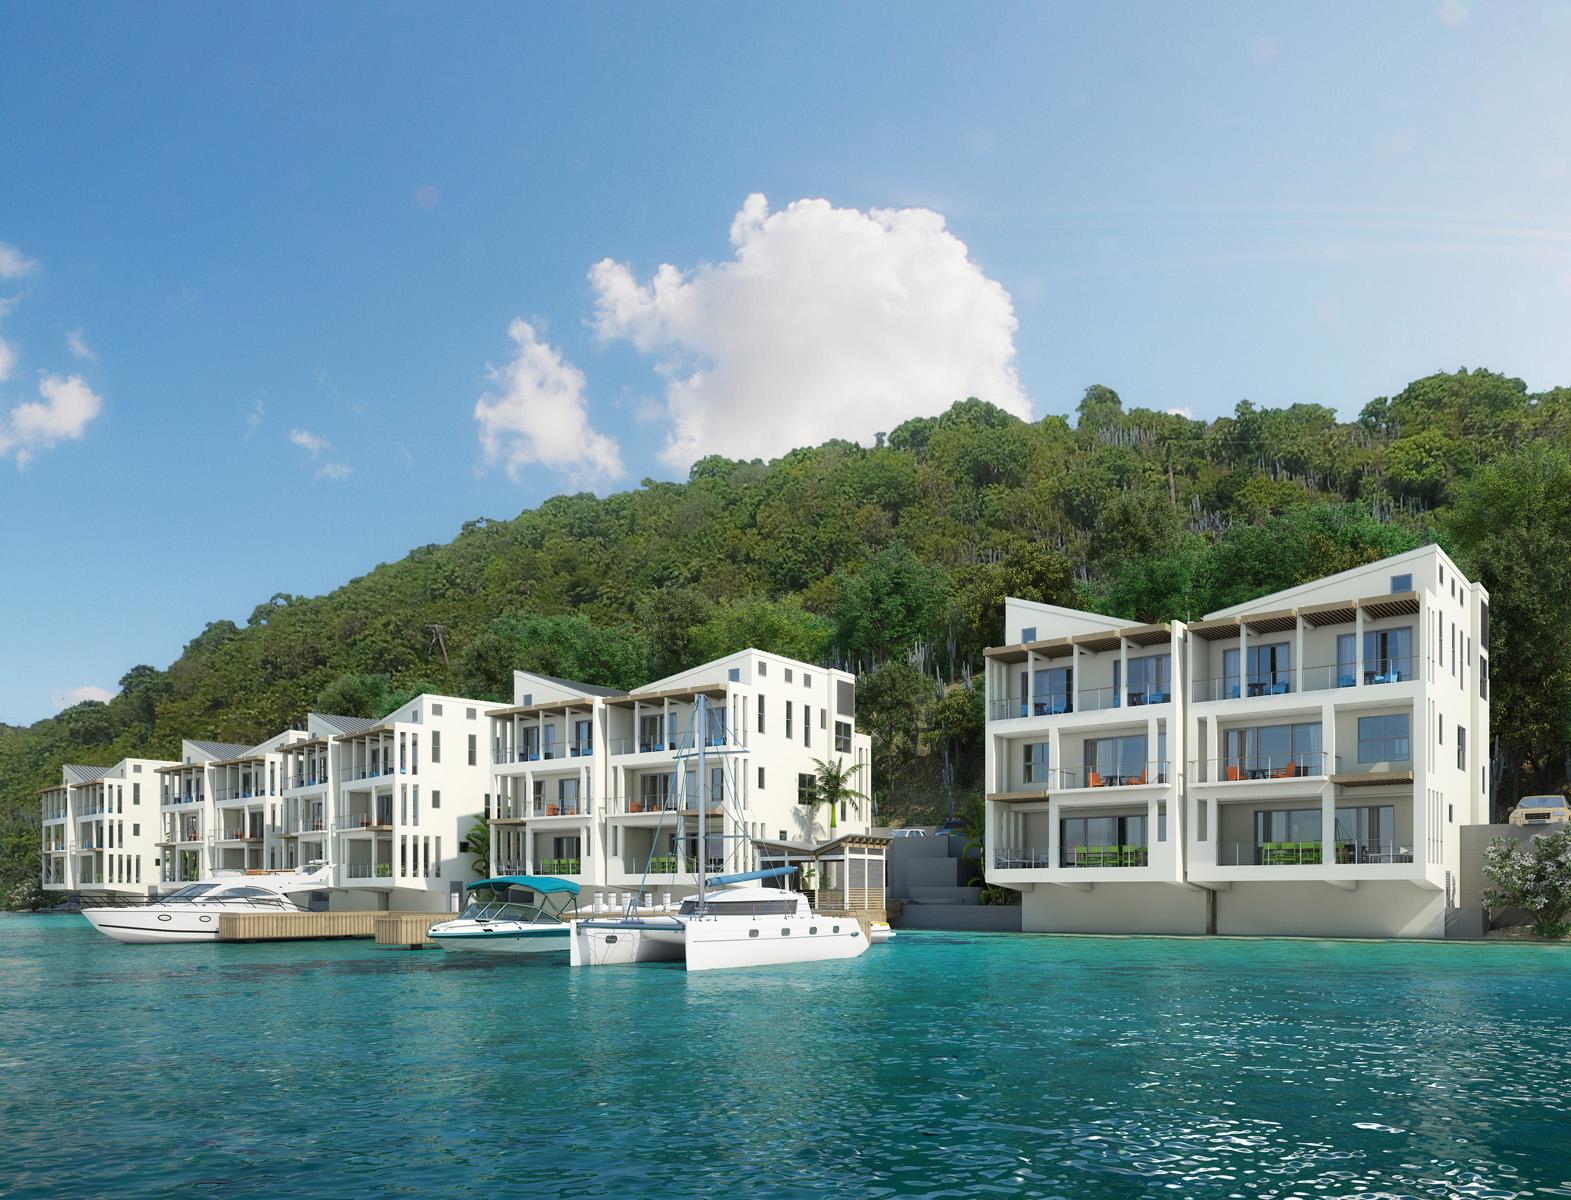 Condominio per Vendita alle ore Brandywine Bay Oceanfront Condos Other Tortola, Tortola, Isole Vergini Britanniche